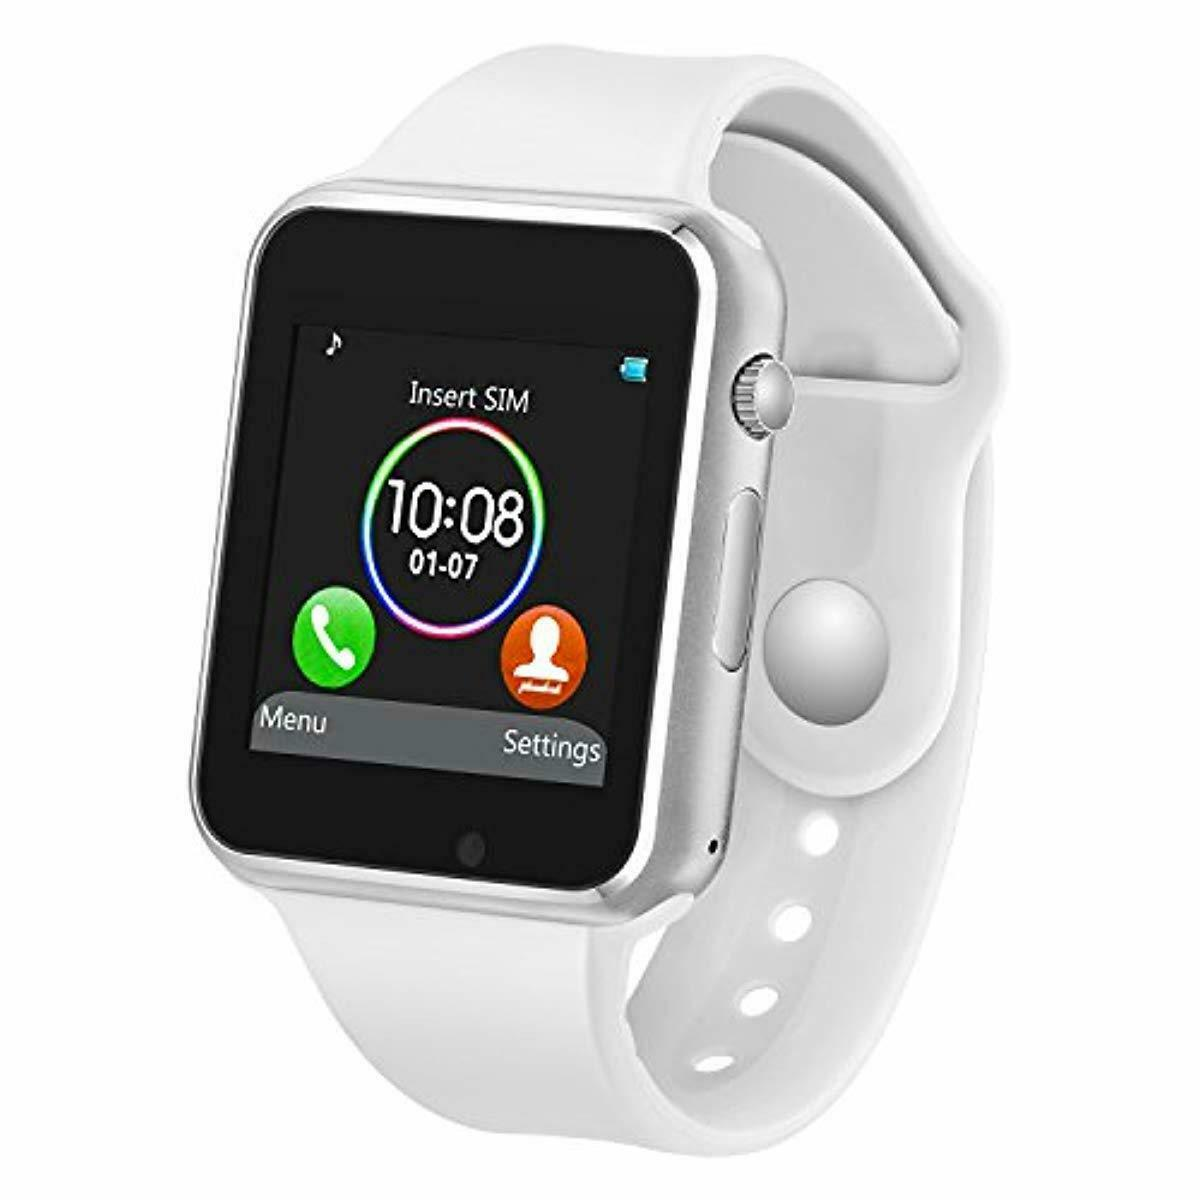 2638ded20955 Reloj Inteligente PARA iPHONE ANDROID DE MUJER HOMBRE Relojes Inteligentes  Smart